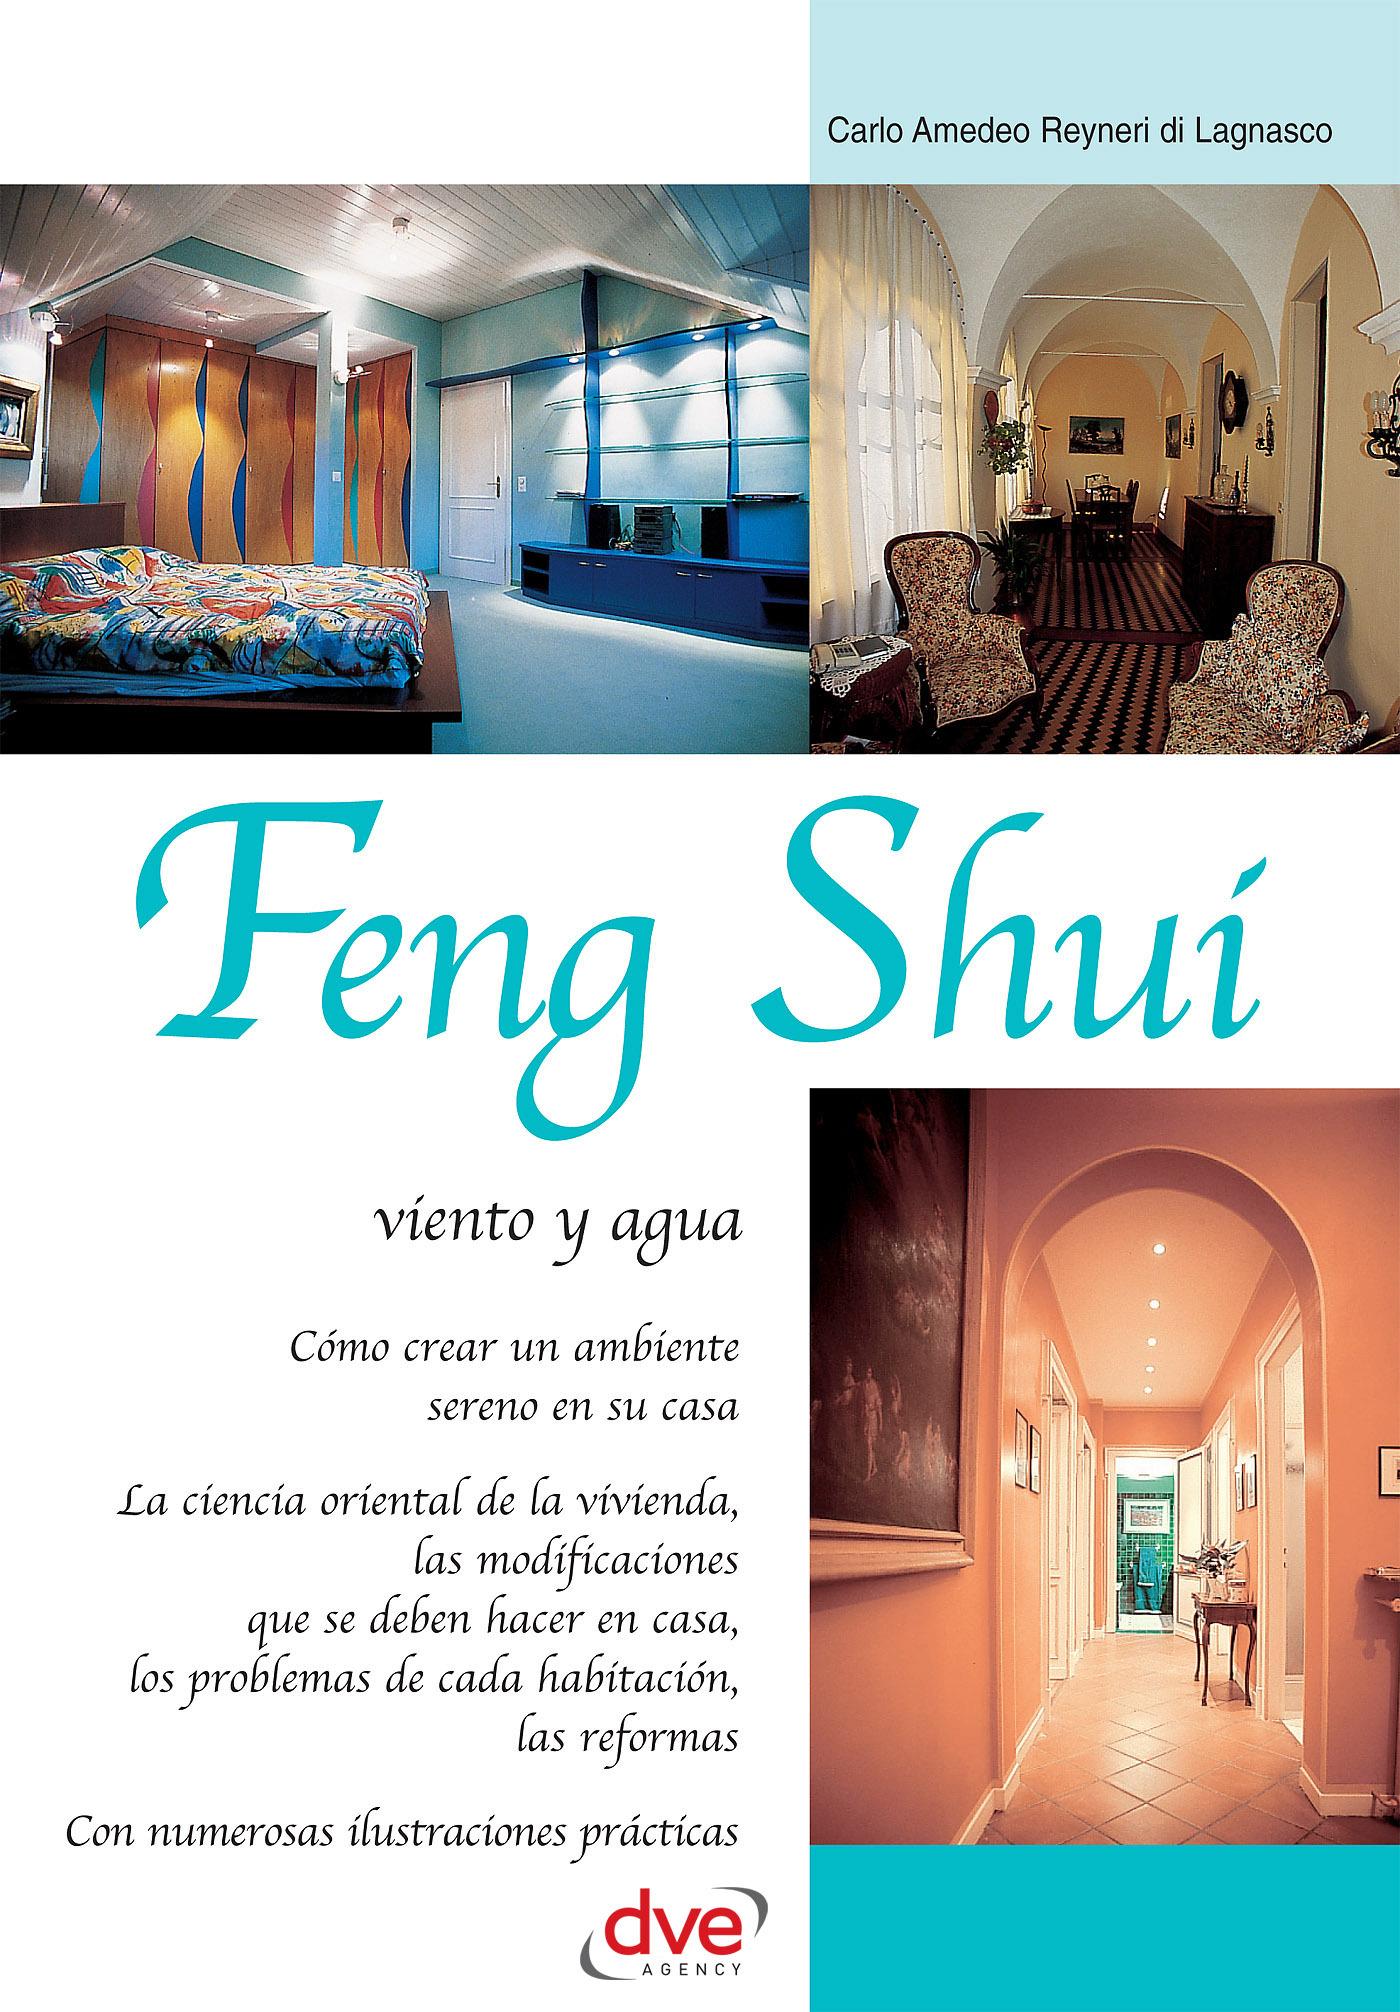 Lagnasco, Carlo Amedeo Reyneri di - Feng Shui: viento y agua, ebook